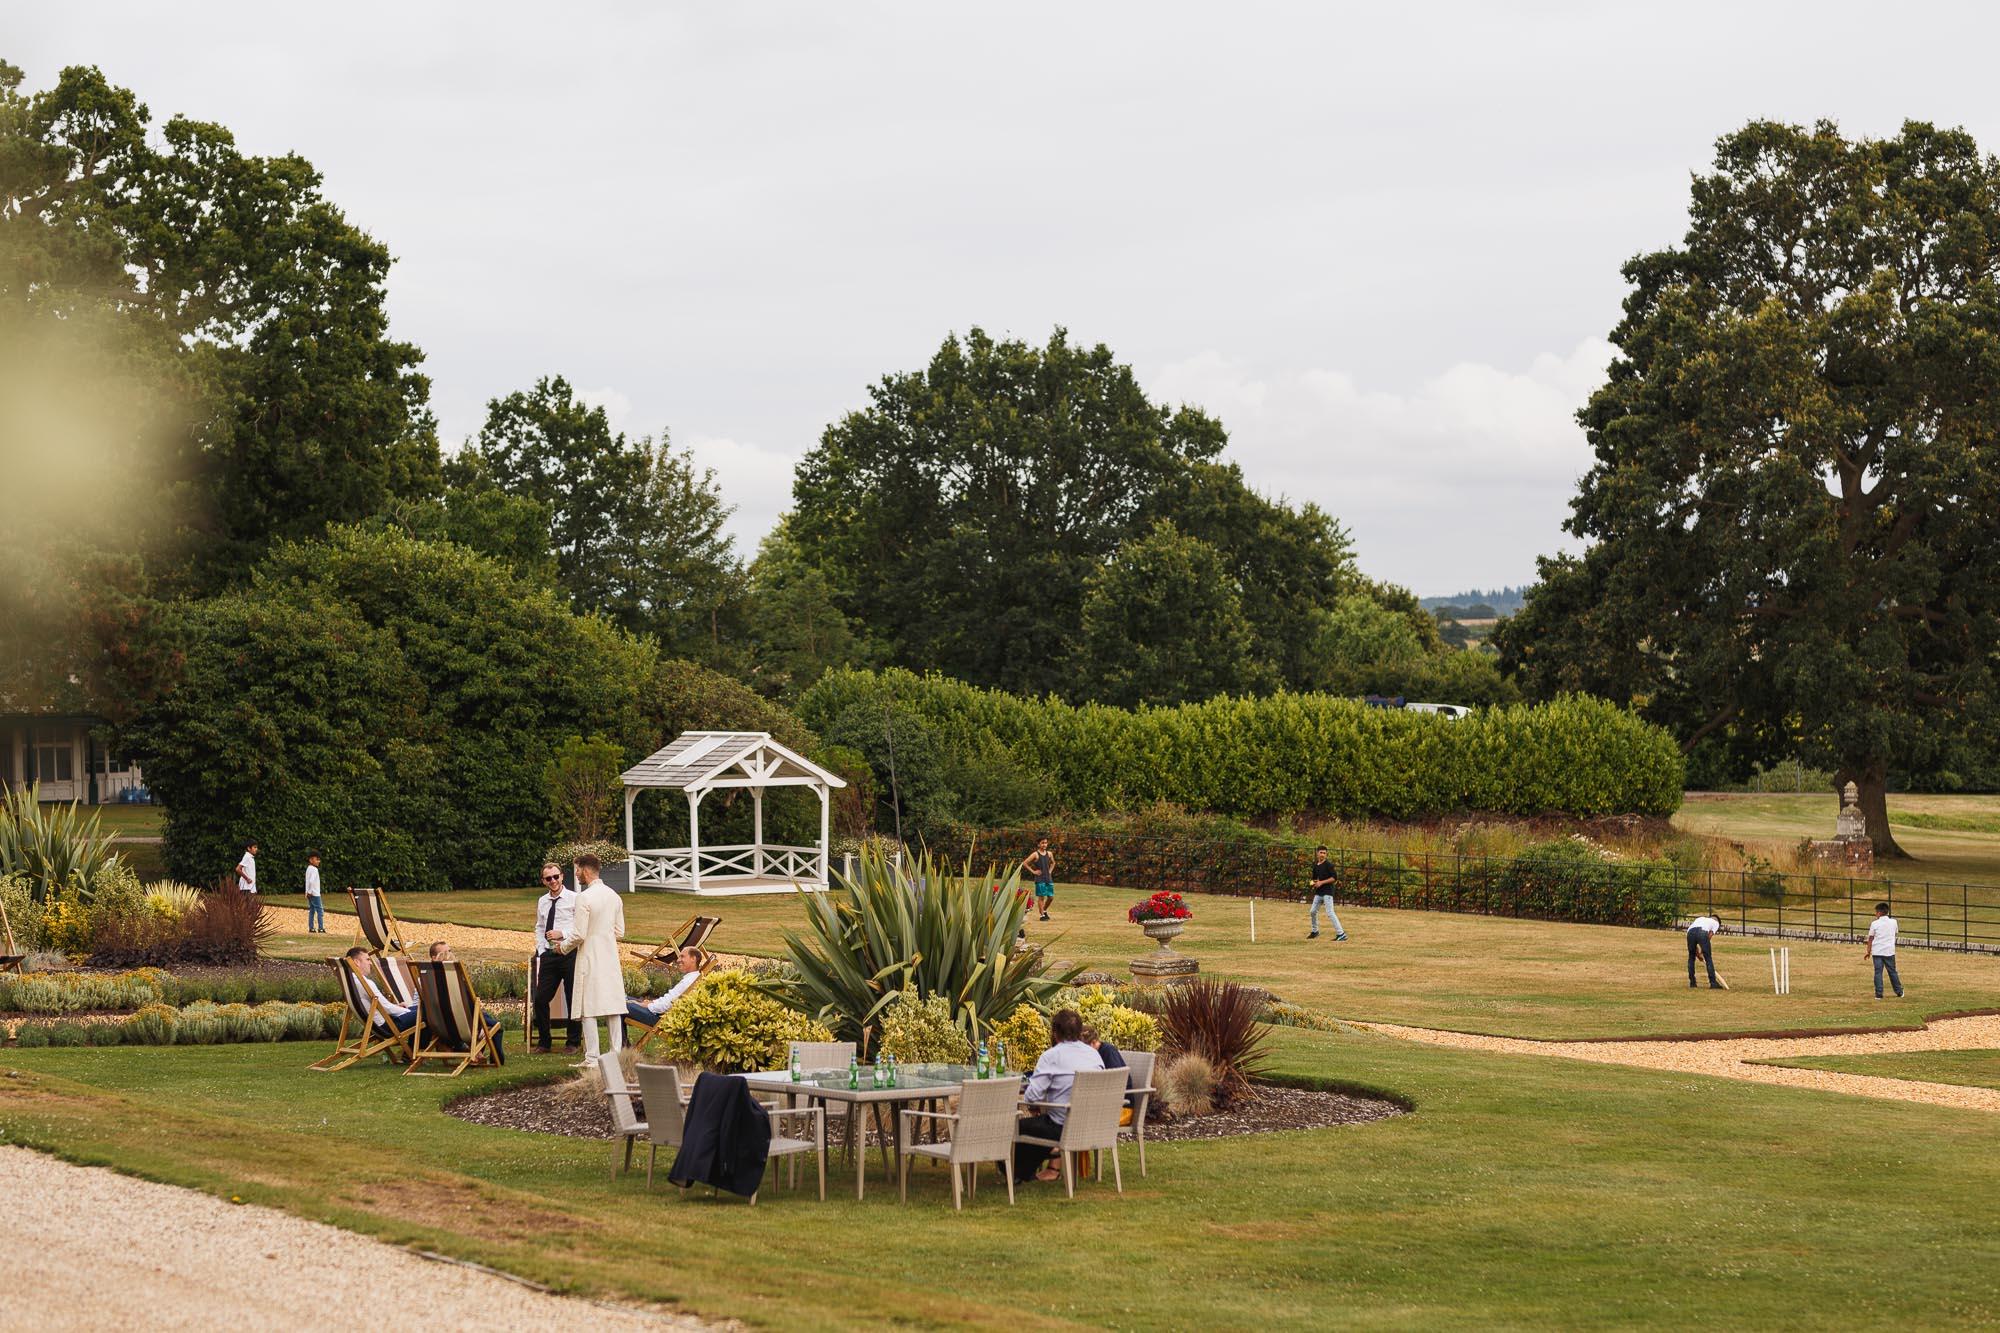 De Vere Wokefield Estate, Asian wedding photographer, wedding venue, cricket